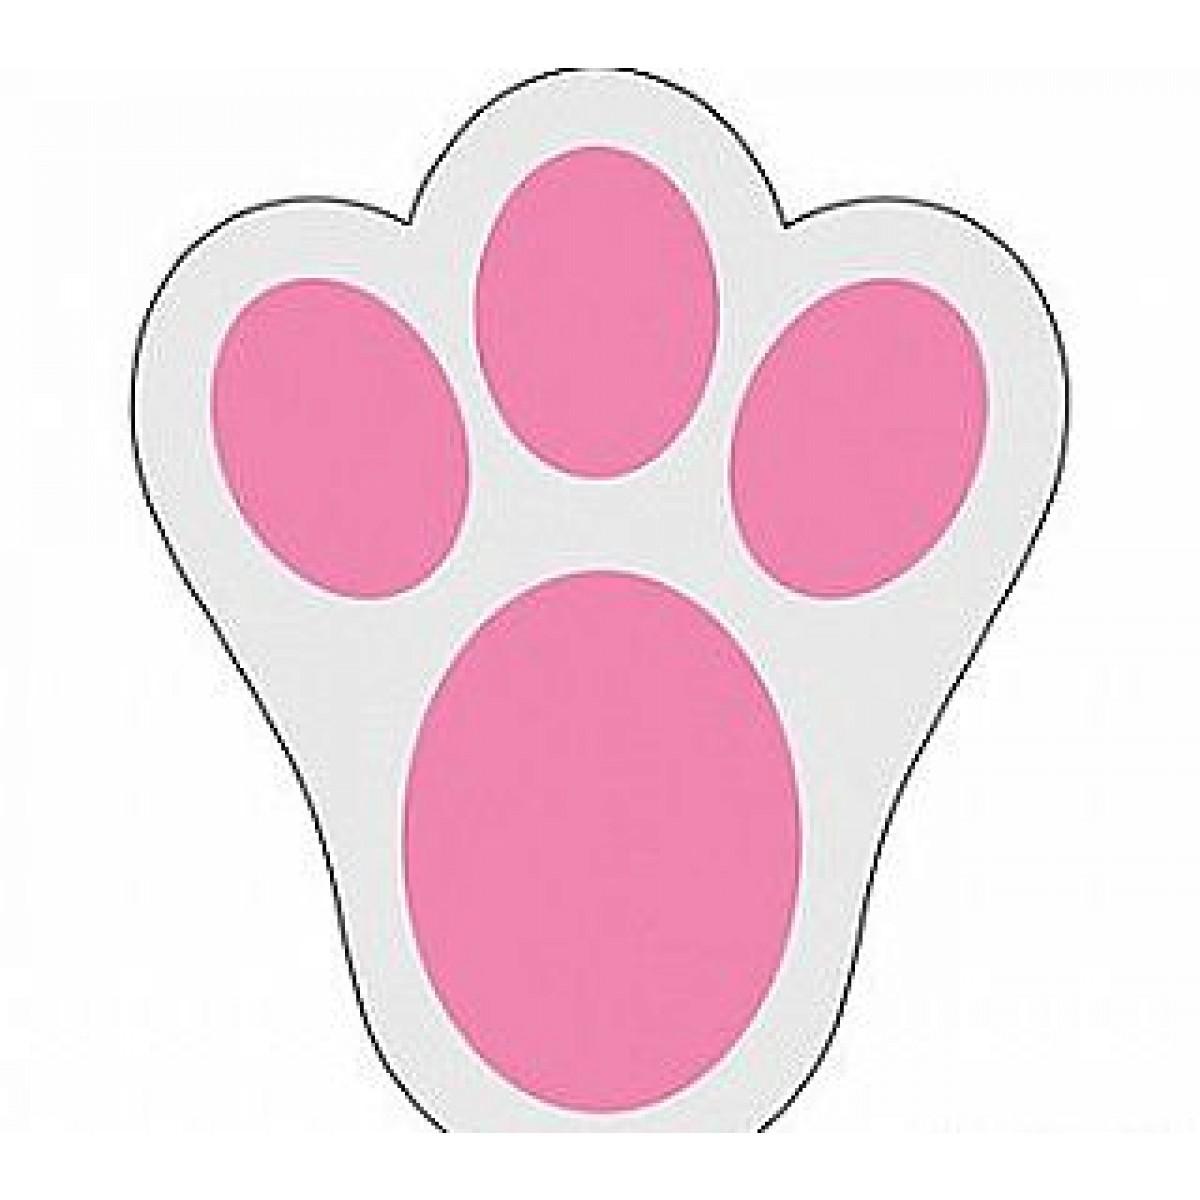 Free Bunny Footprints Cliparts, Download Free Clip Art, Free.